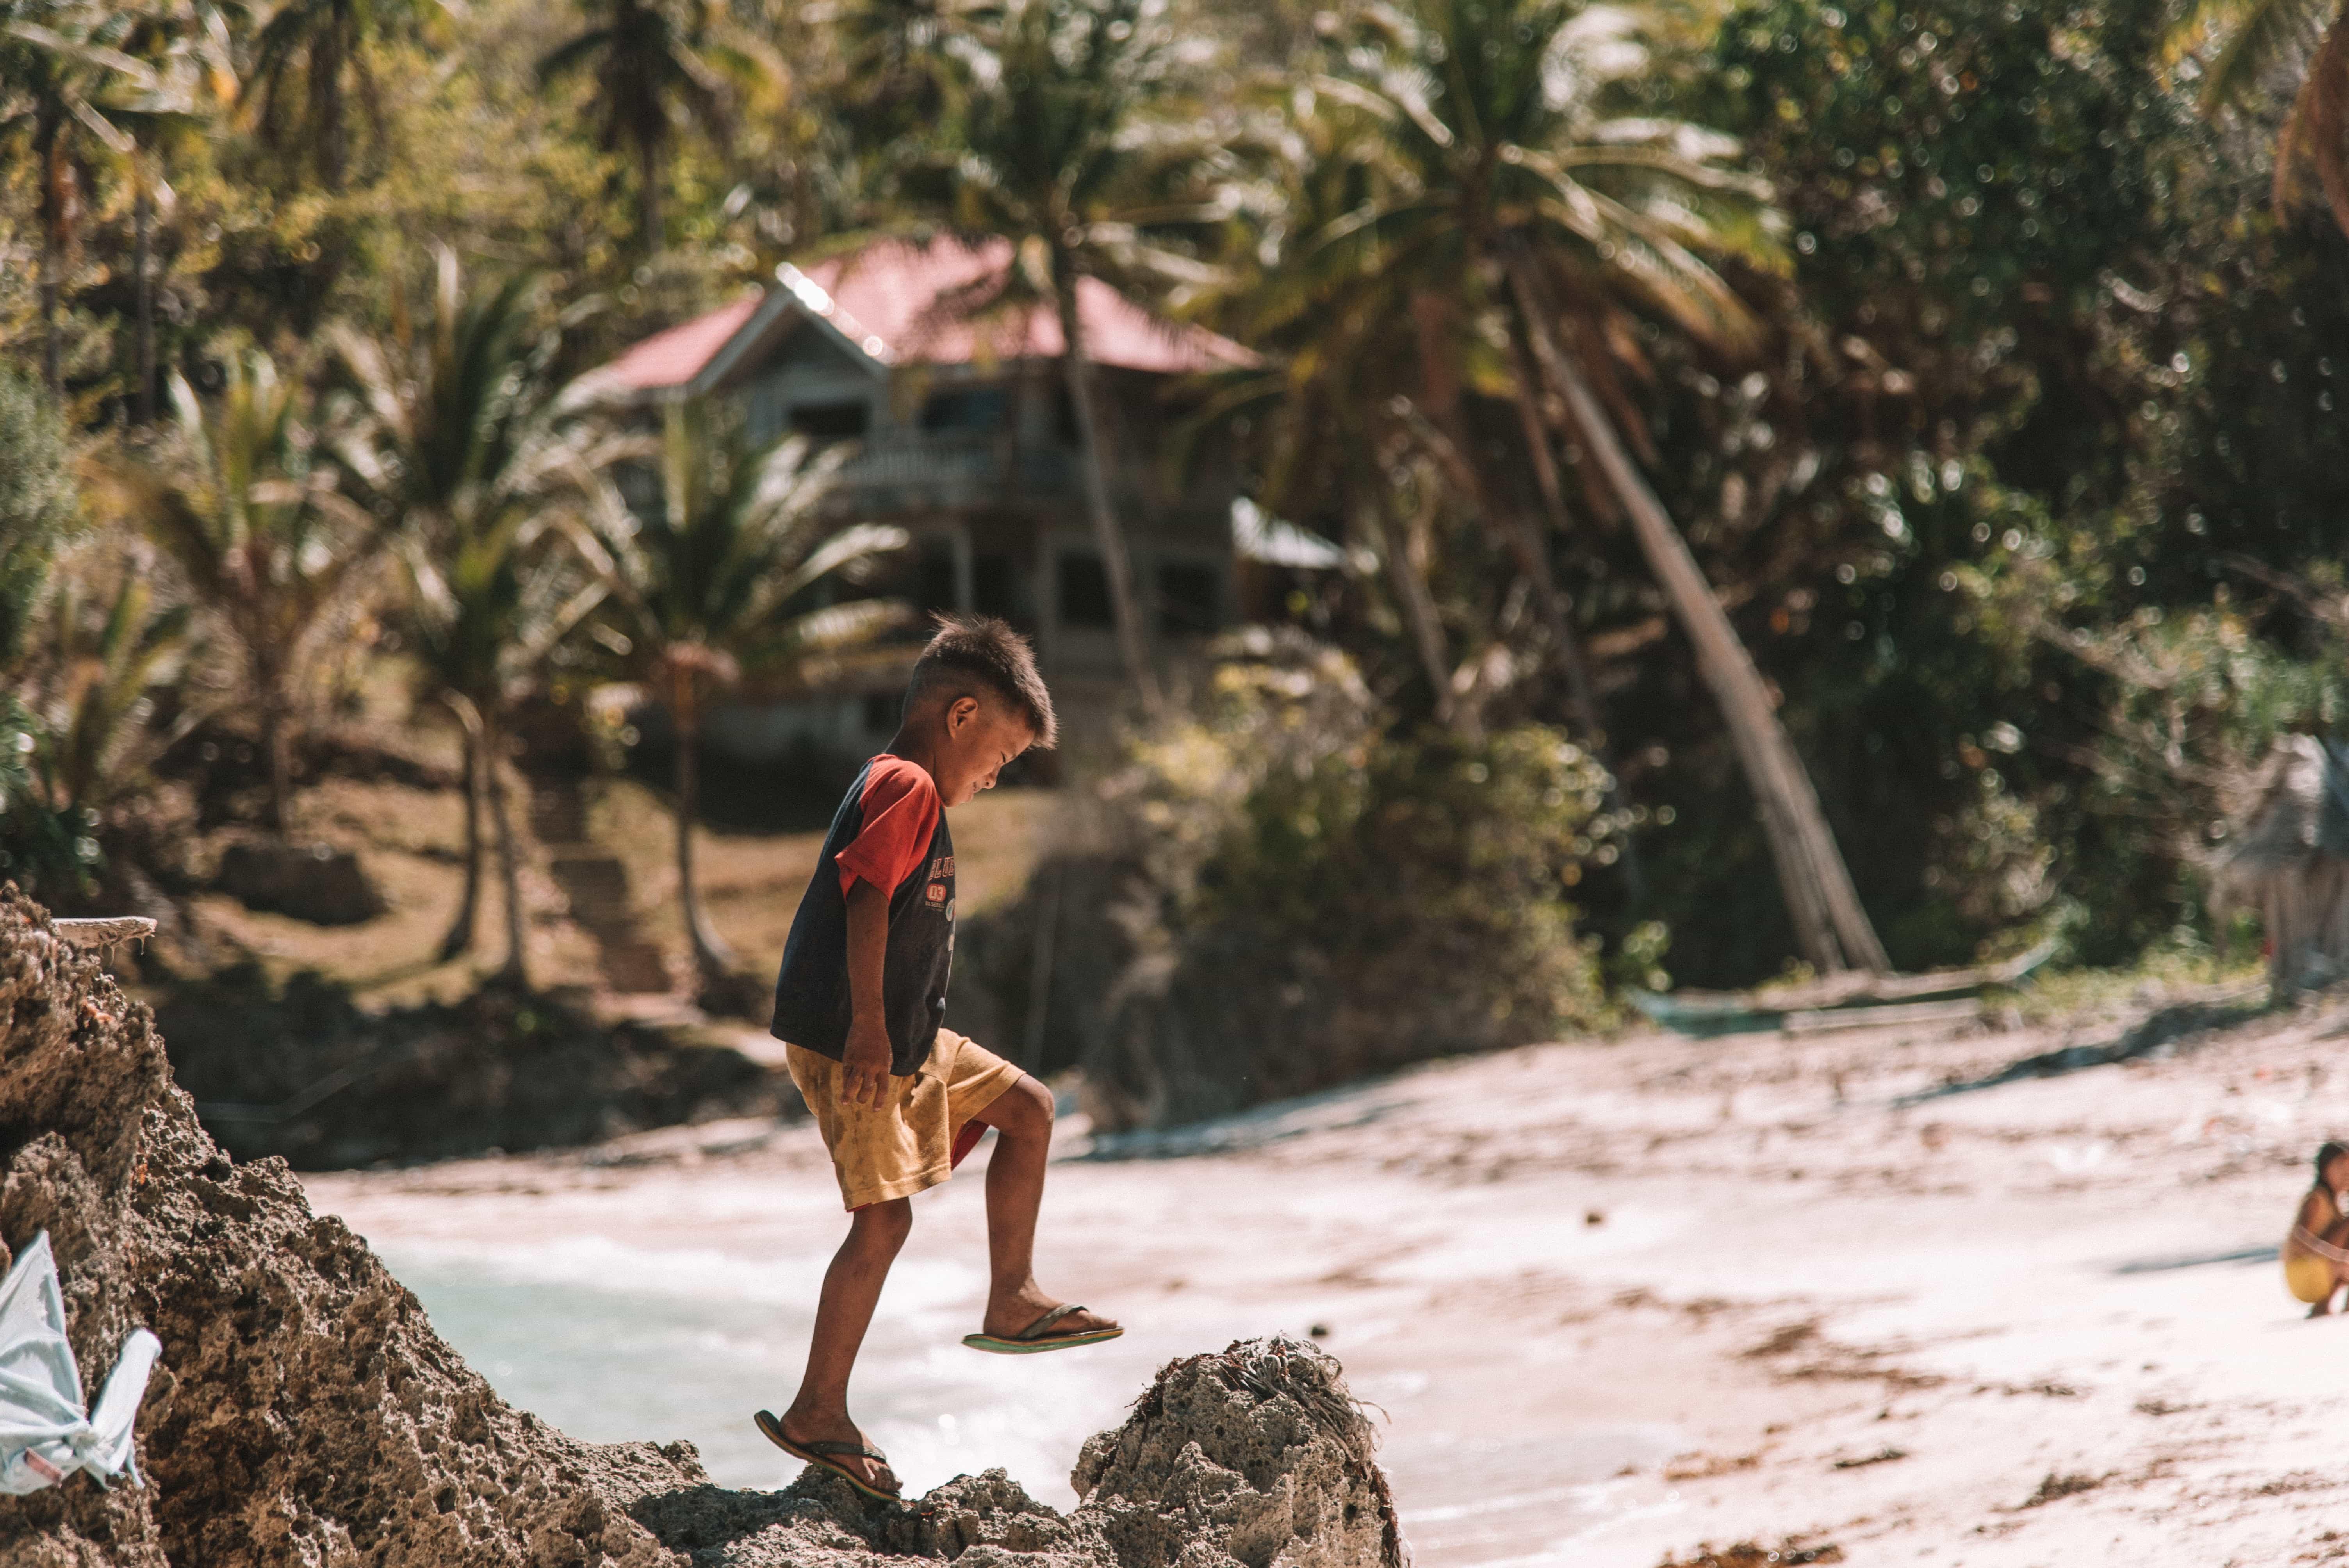 How to get to Carabao Island, Carabao Island travel guide, what to do in Carabao Island, Carabao Island, secret beach in Carabao Island